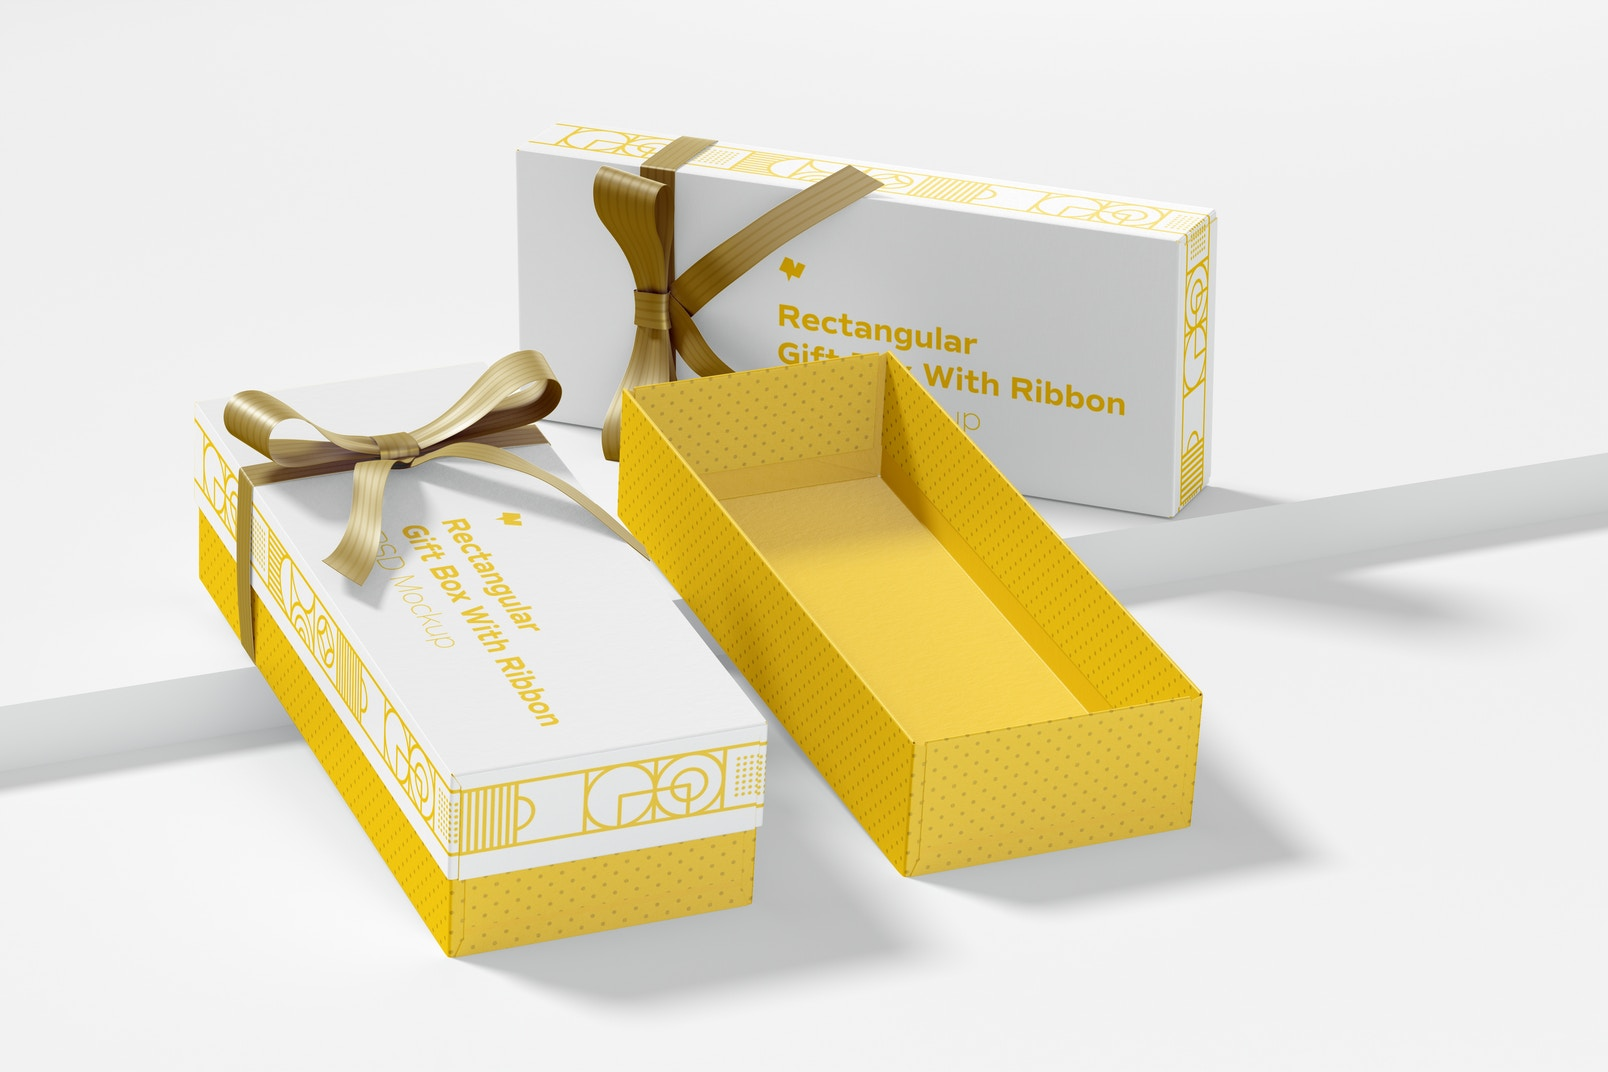 Rectangular Gift Boxes With Ribbon Mockup